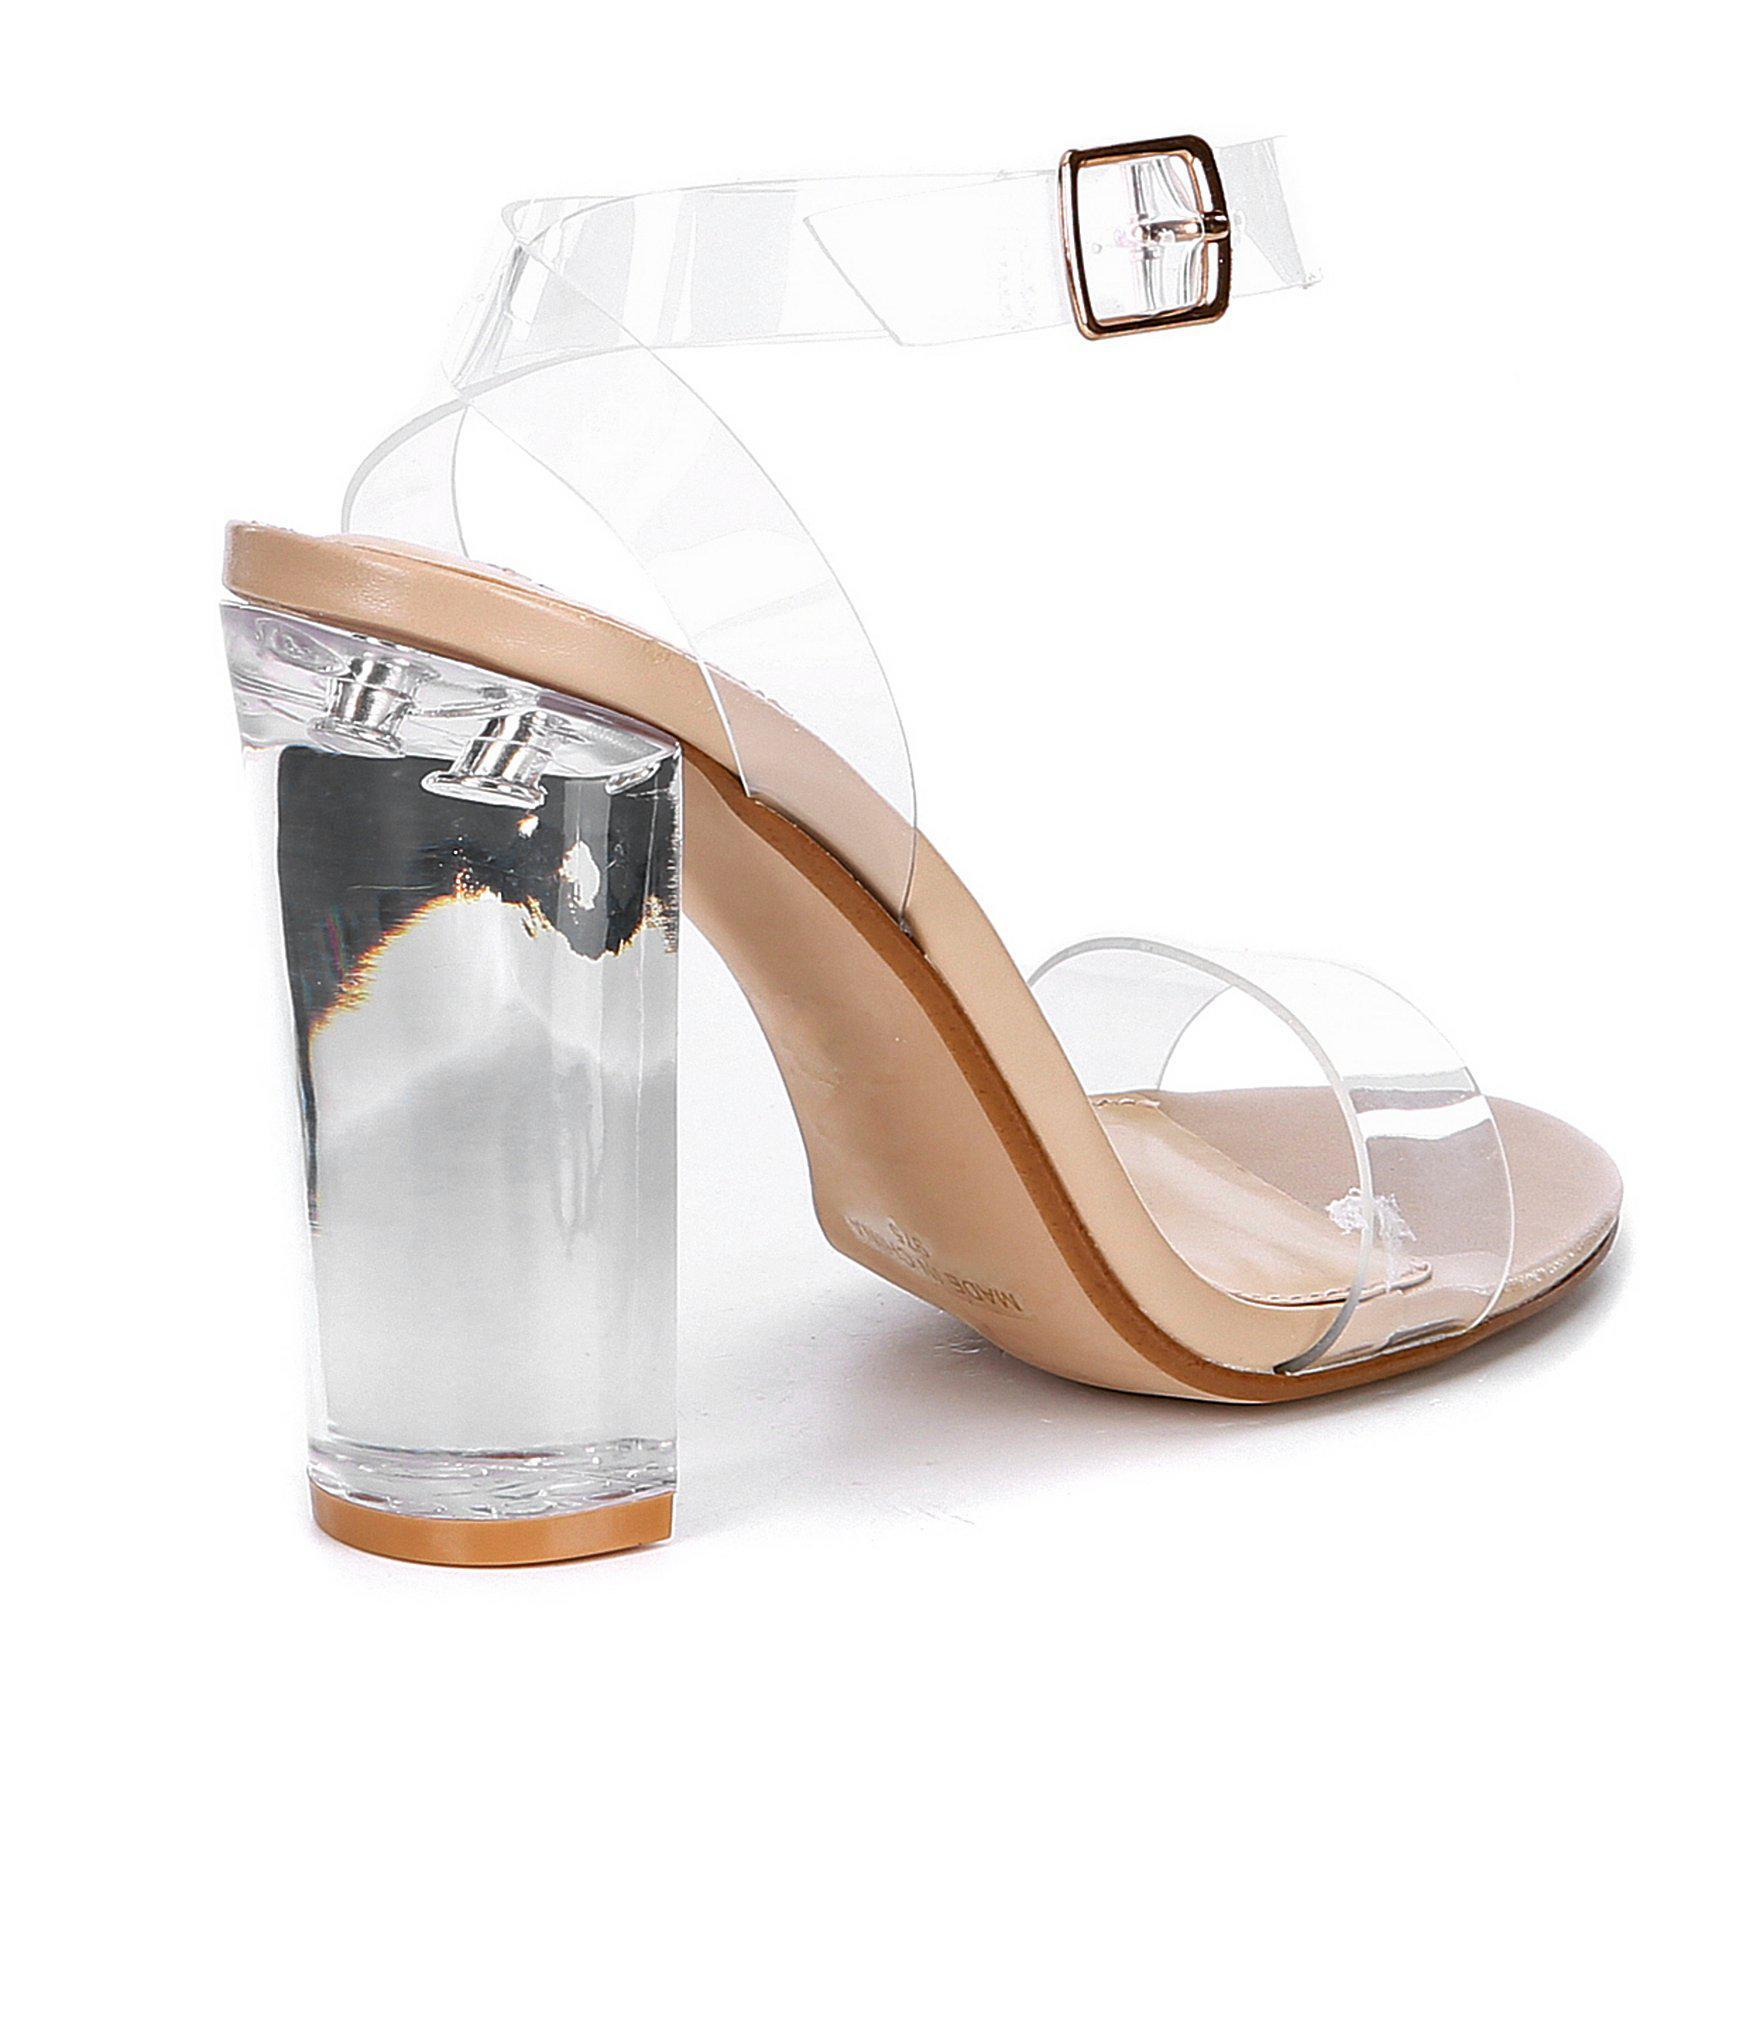 1b47befd63d Steve Madden - Multicolor Camille Lucite Clear Block Heel Dress Sandals -  Lyst. View fullscreen